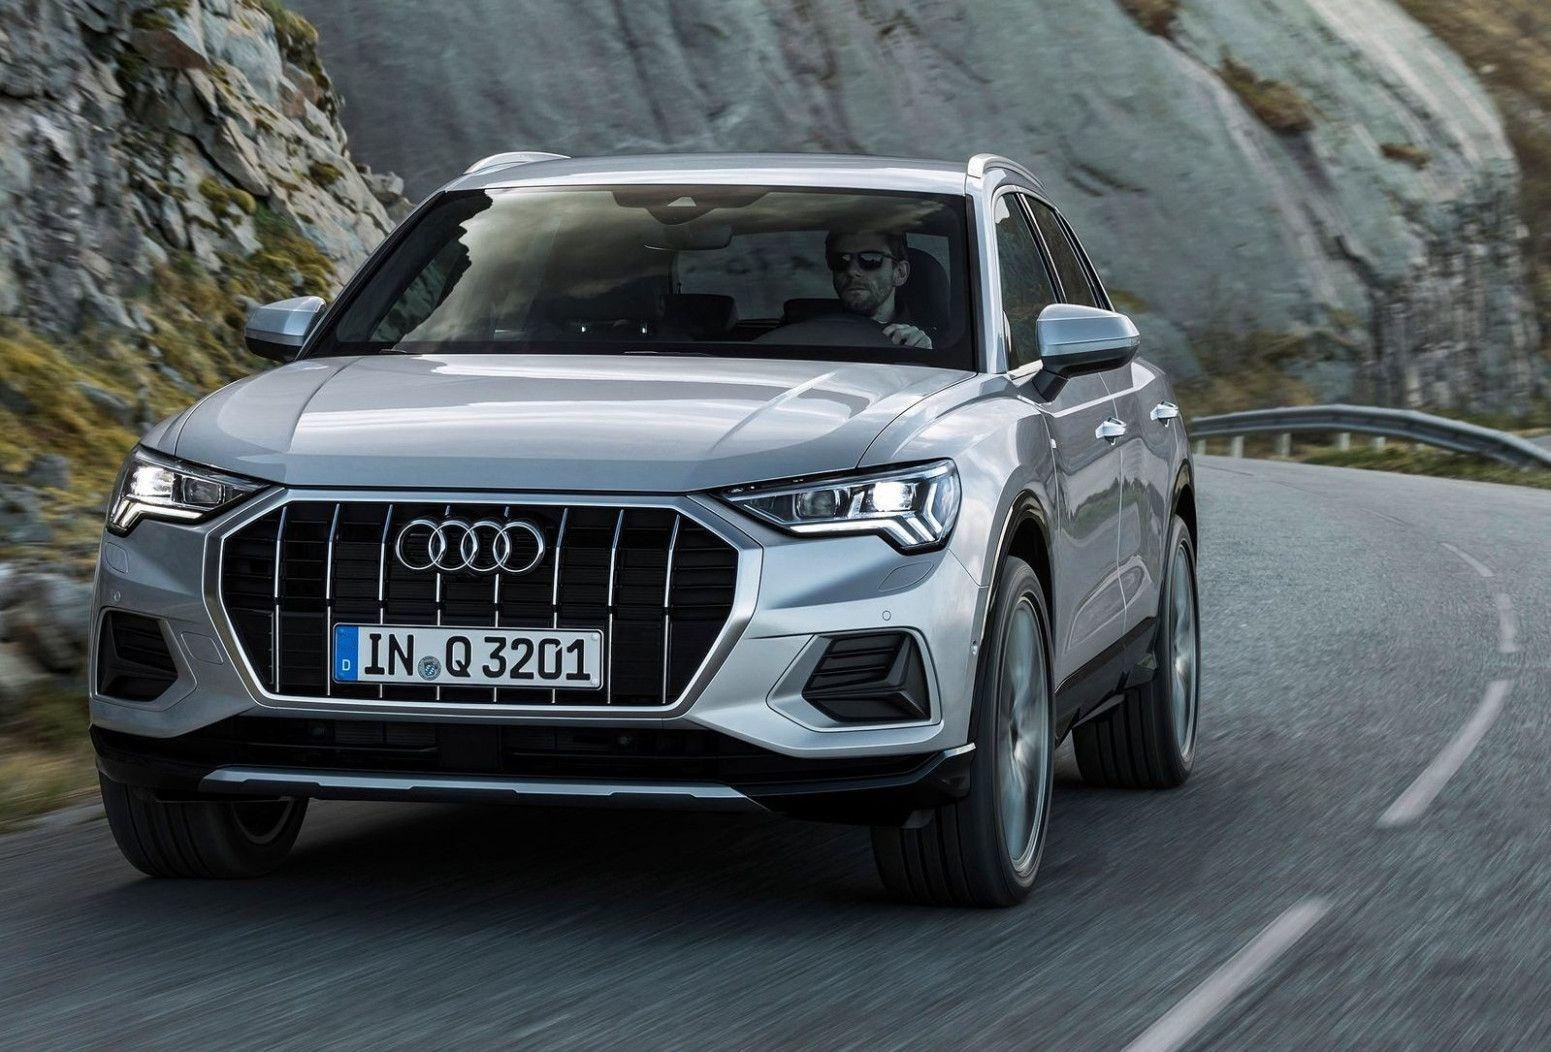 Audi Q3 Hybrid 2020 Concept In 2020 Audi Q3 Audi Car